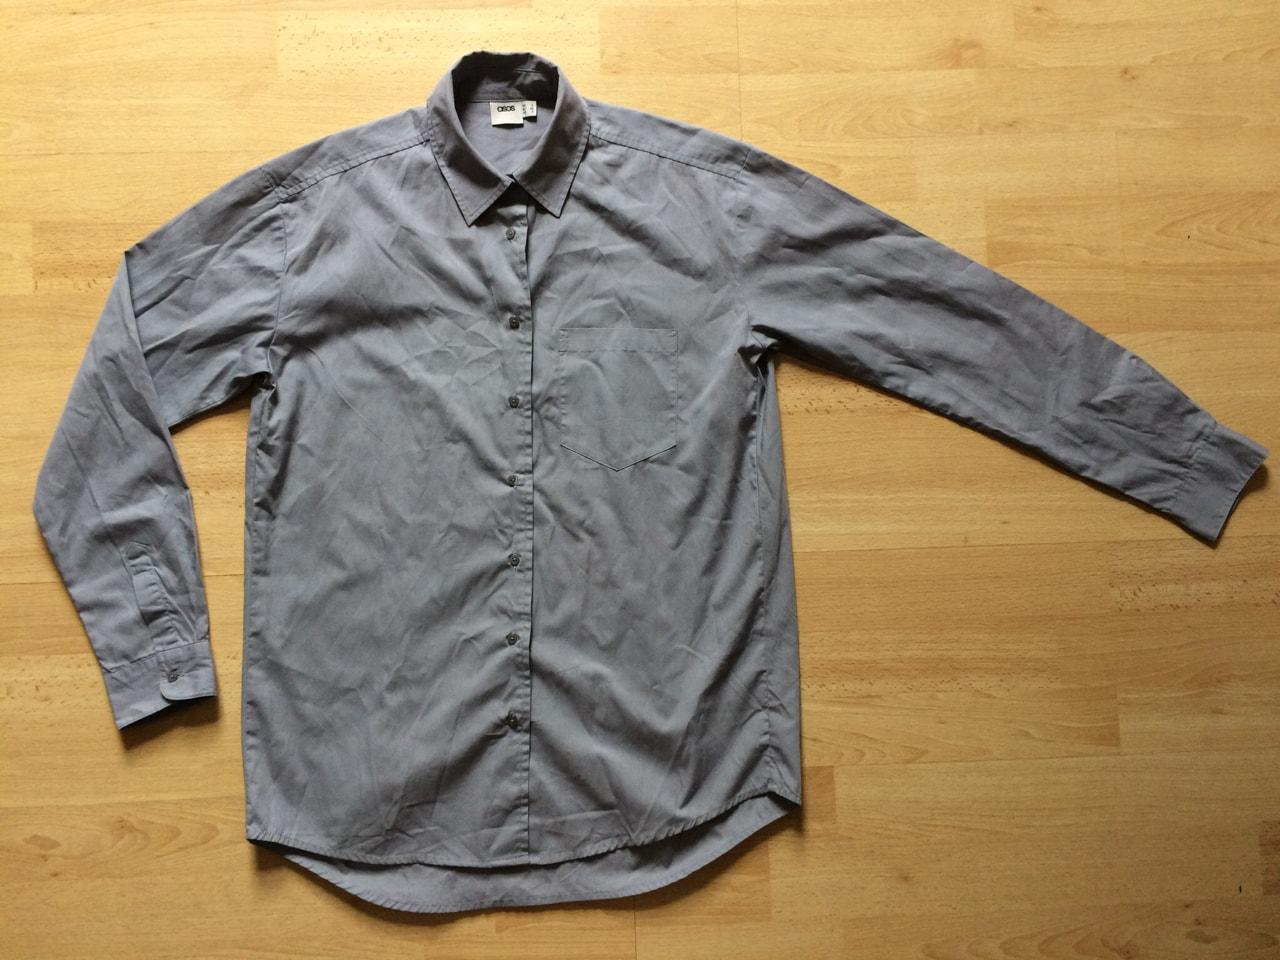 ASOS women's grey oversized shirt size 4